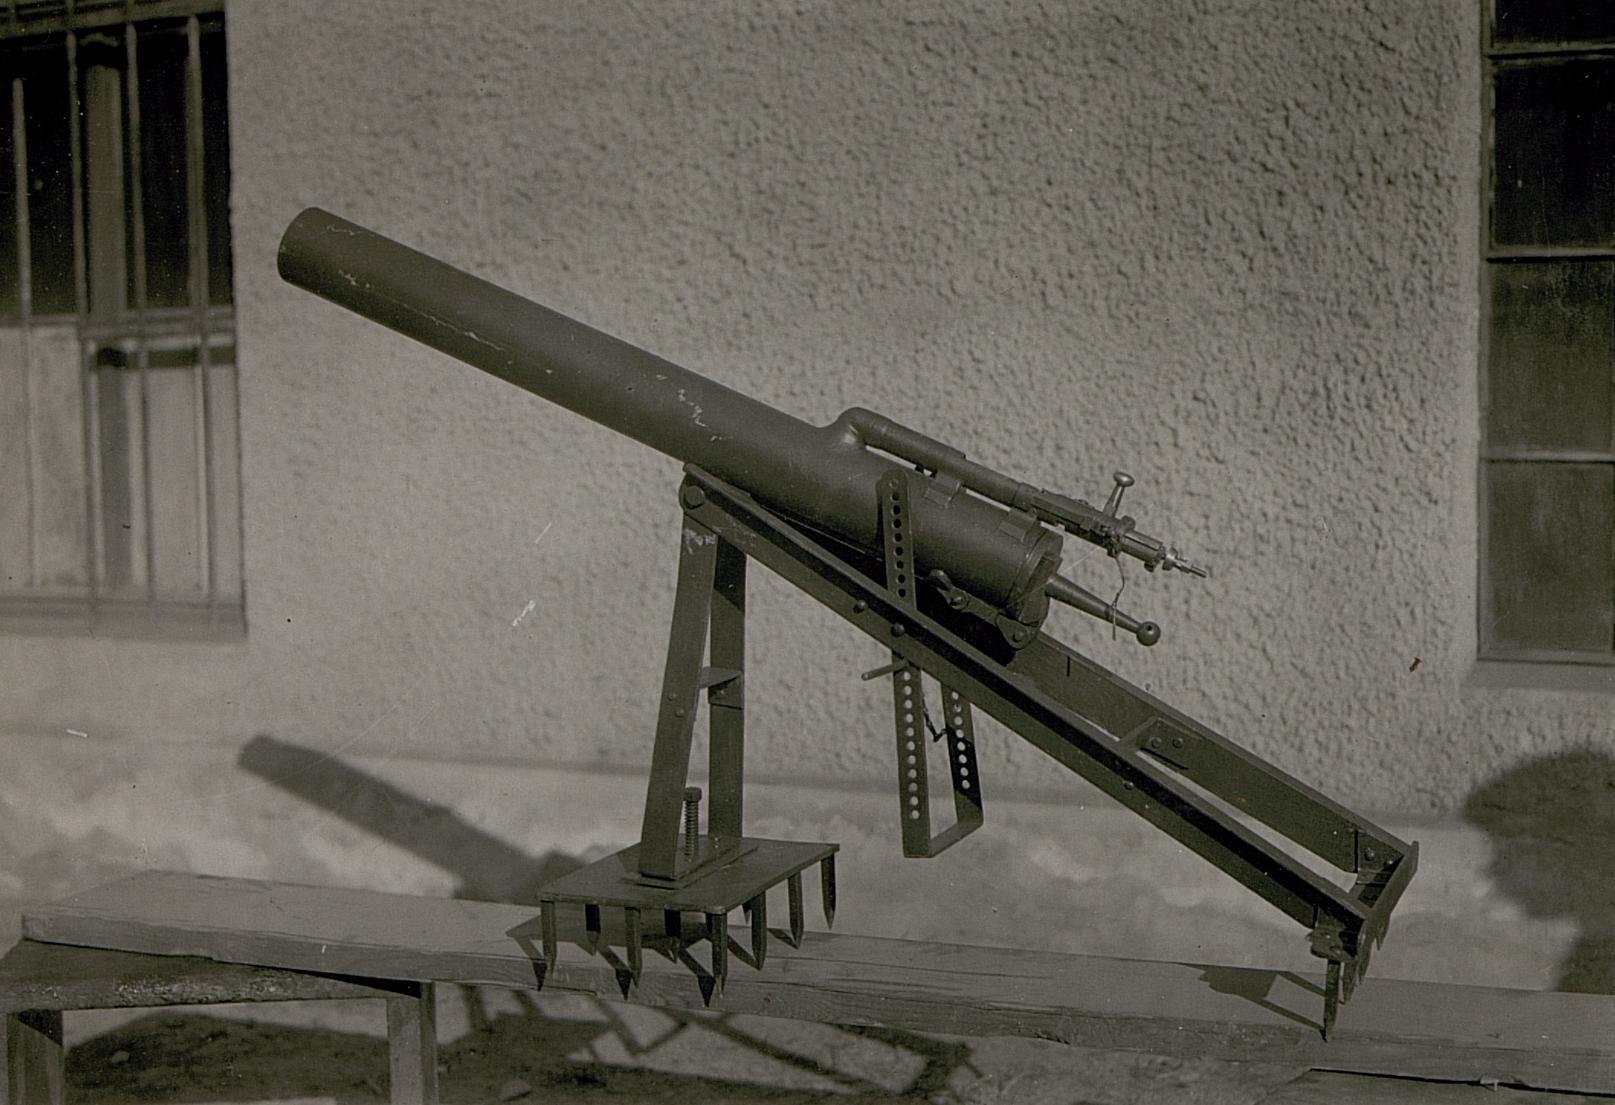 3 8 Bolt >> Aasen mortar - Wikipedia